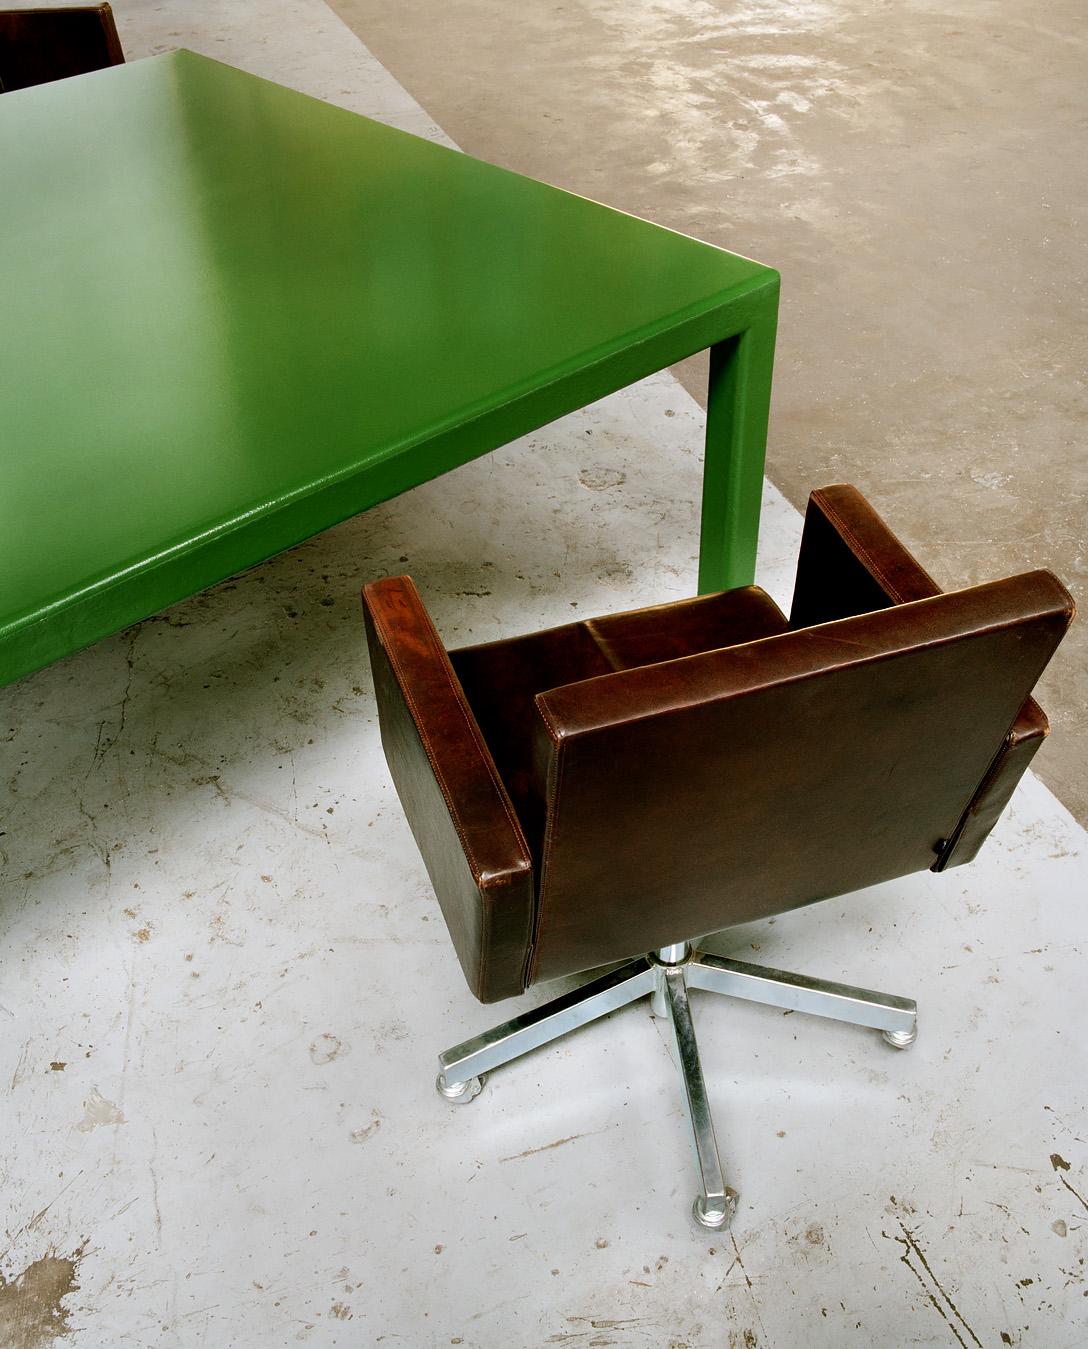 Lensvelt-AVL-Office-Chair-AVL-Workbench-Atelier-van-Lieshout-3